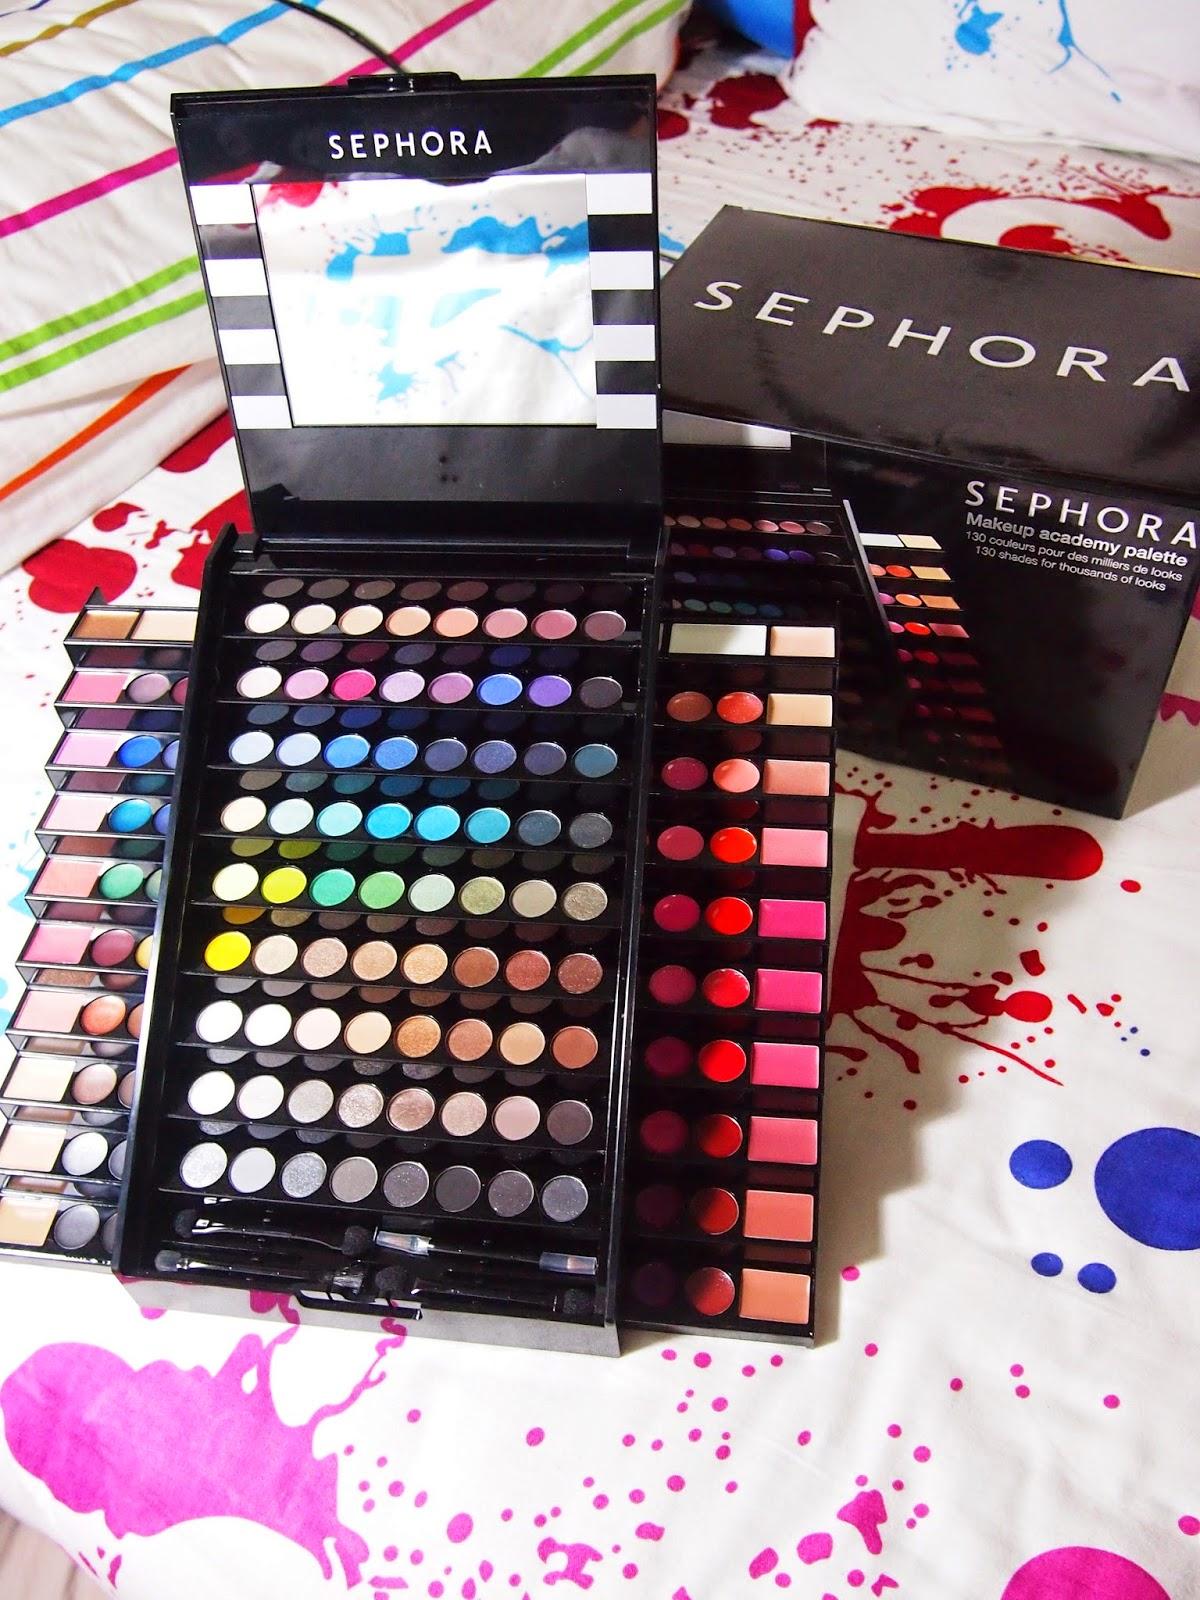 sephora makeup academy palette. sephora makeup academy blockbuster 2013 - lips (1) sephora palette p